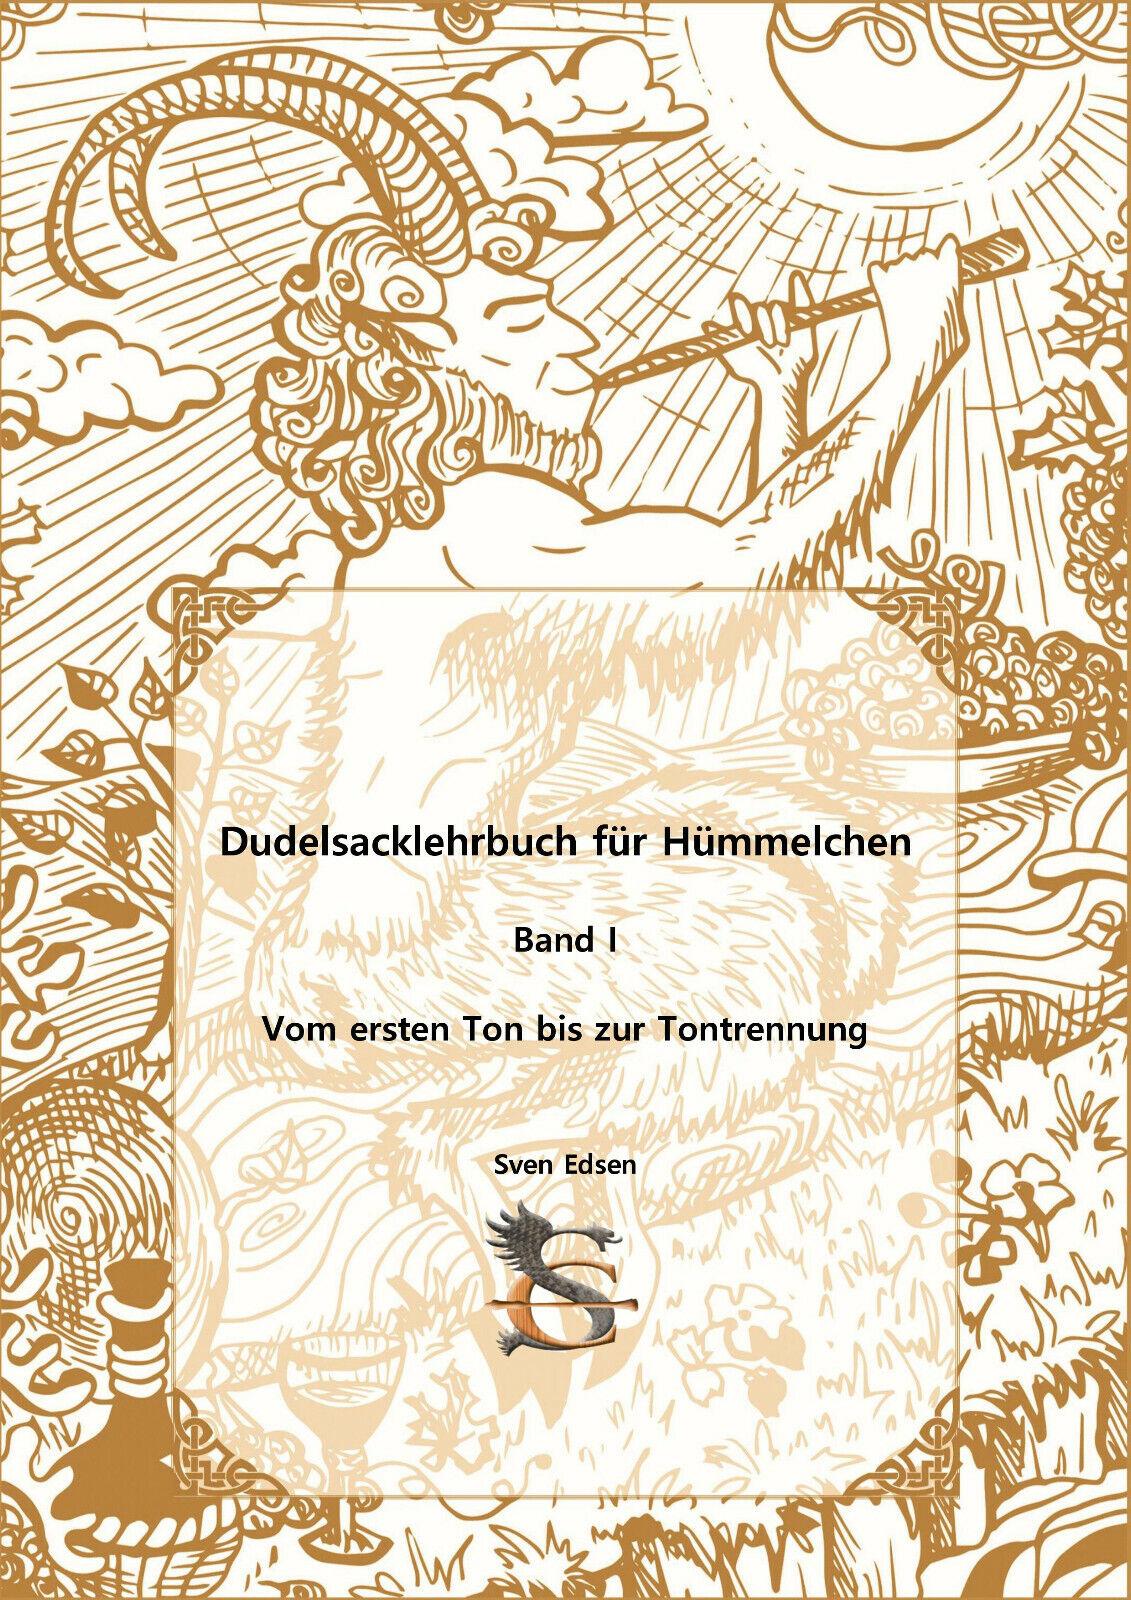 Dudelsack Lehrbuch für Hümmelchen Band I Sackpfeife lernen